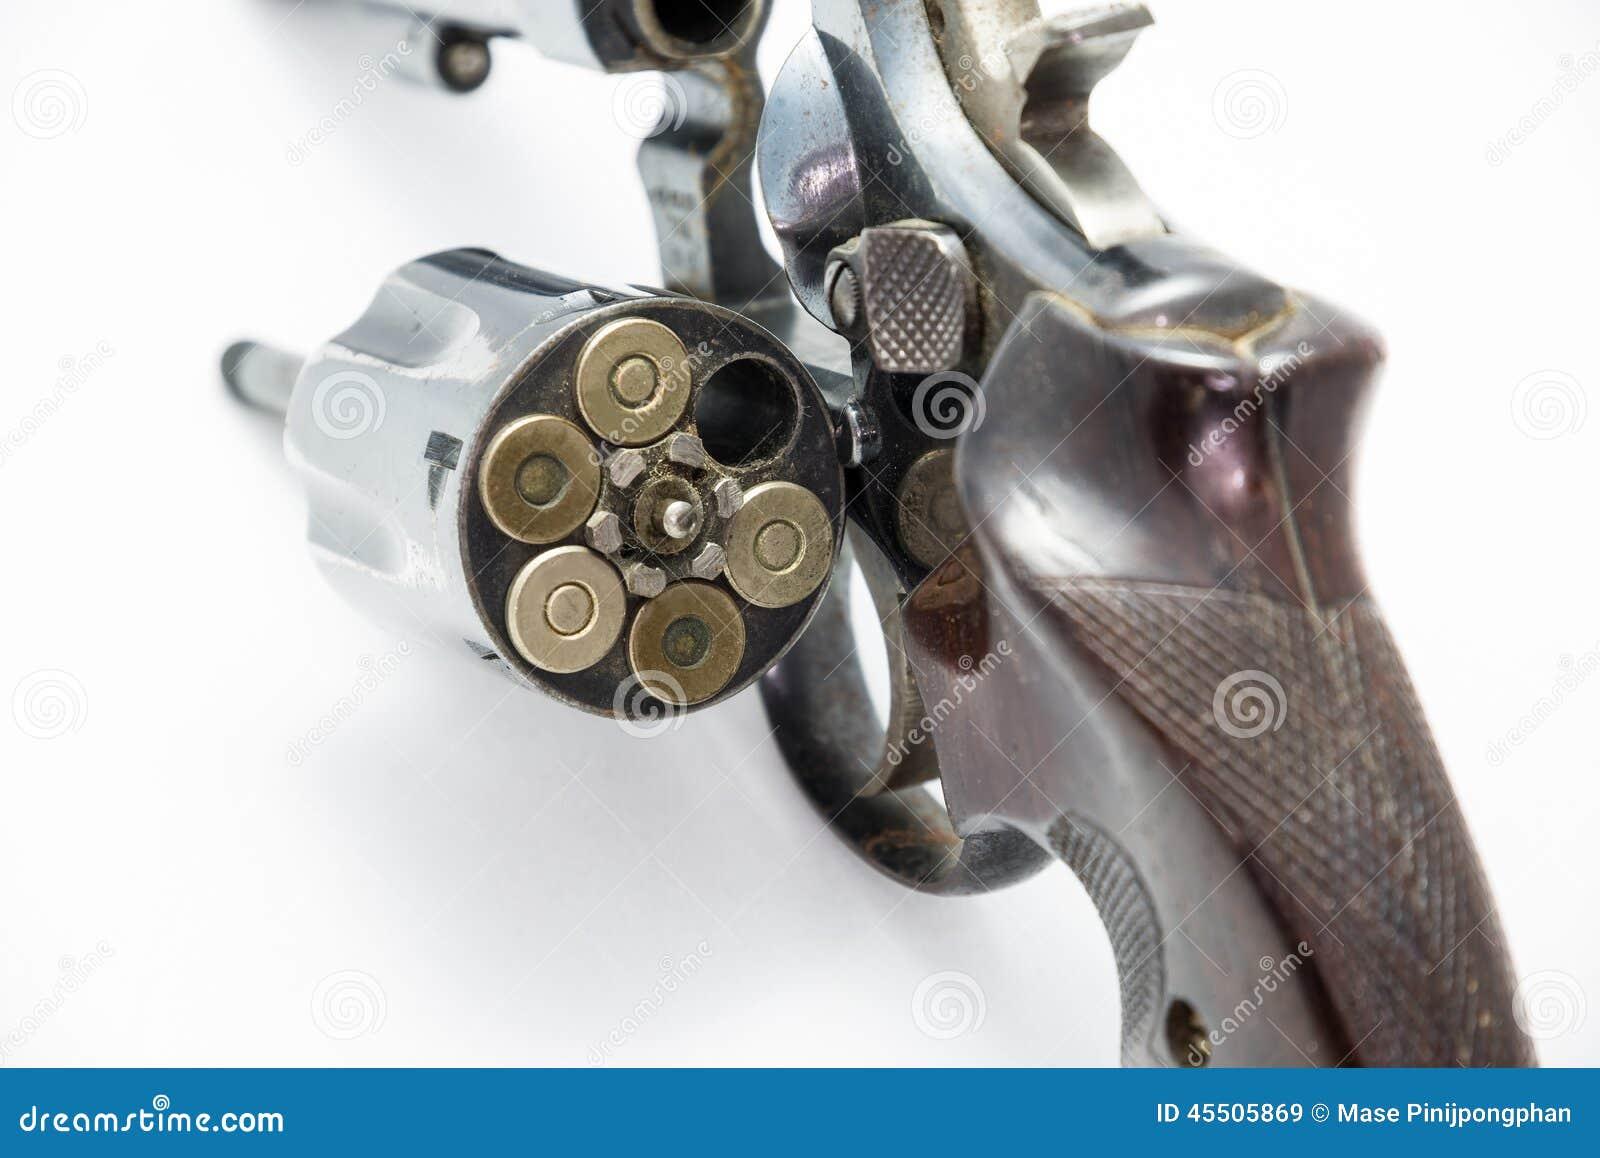 a handgun revolver chamber is open showing ammunition gun cylinder clipart images cylinder clipart images